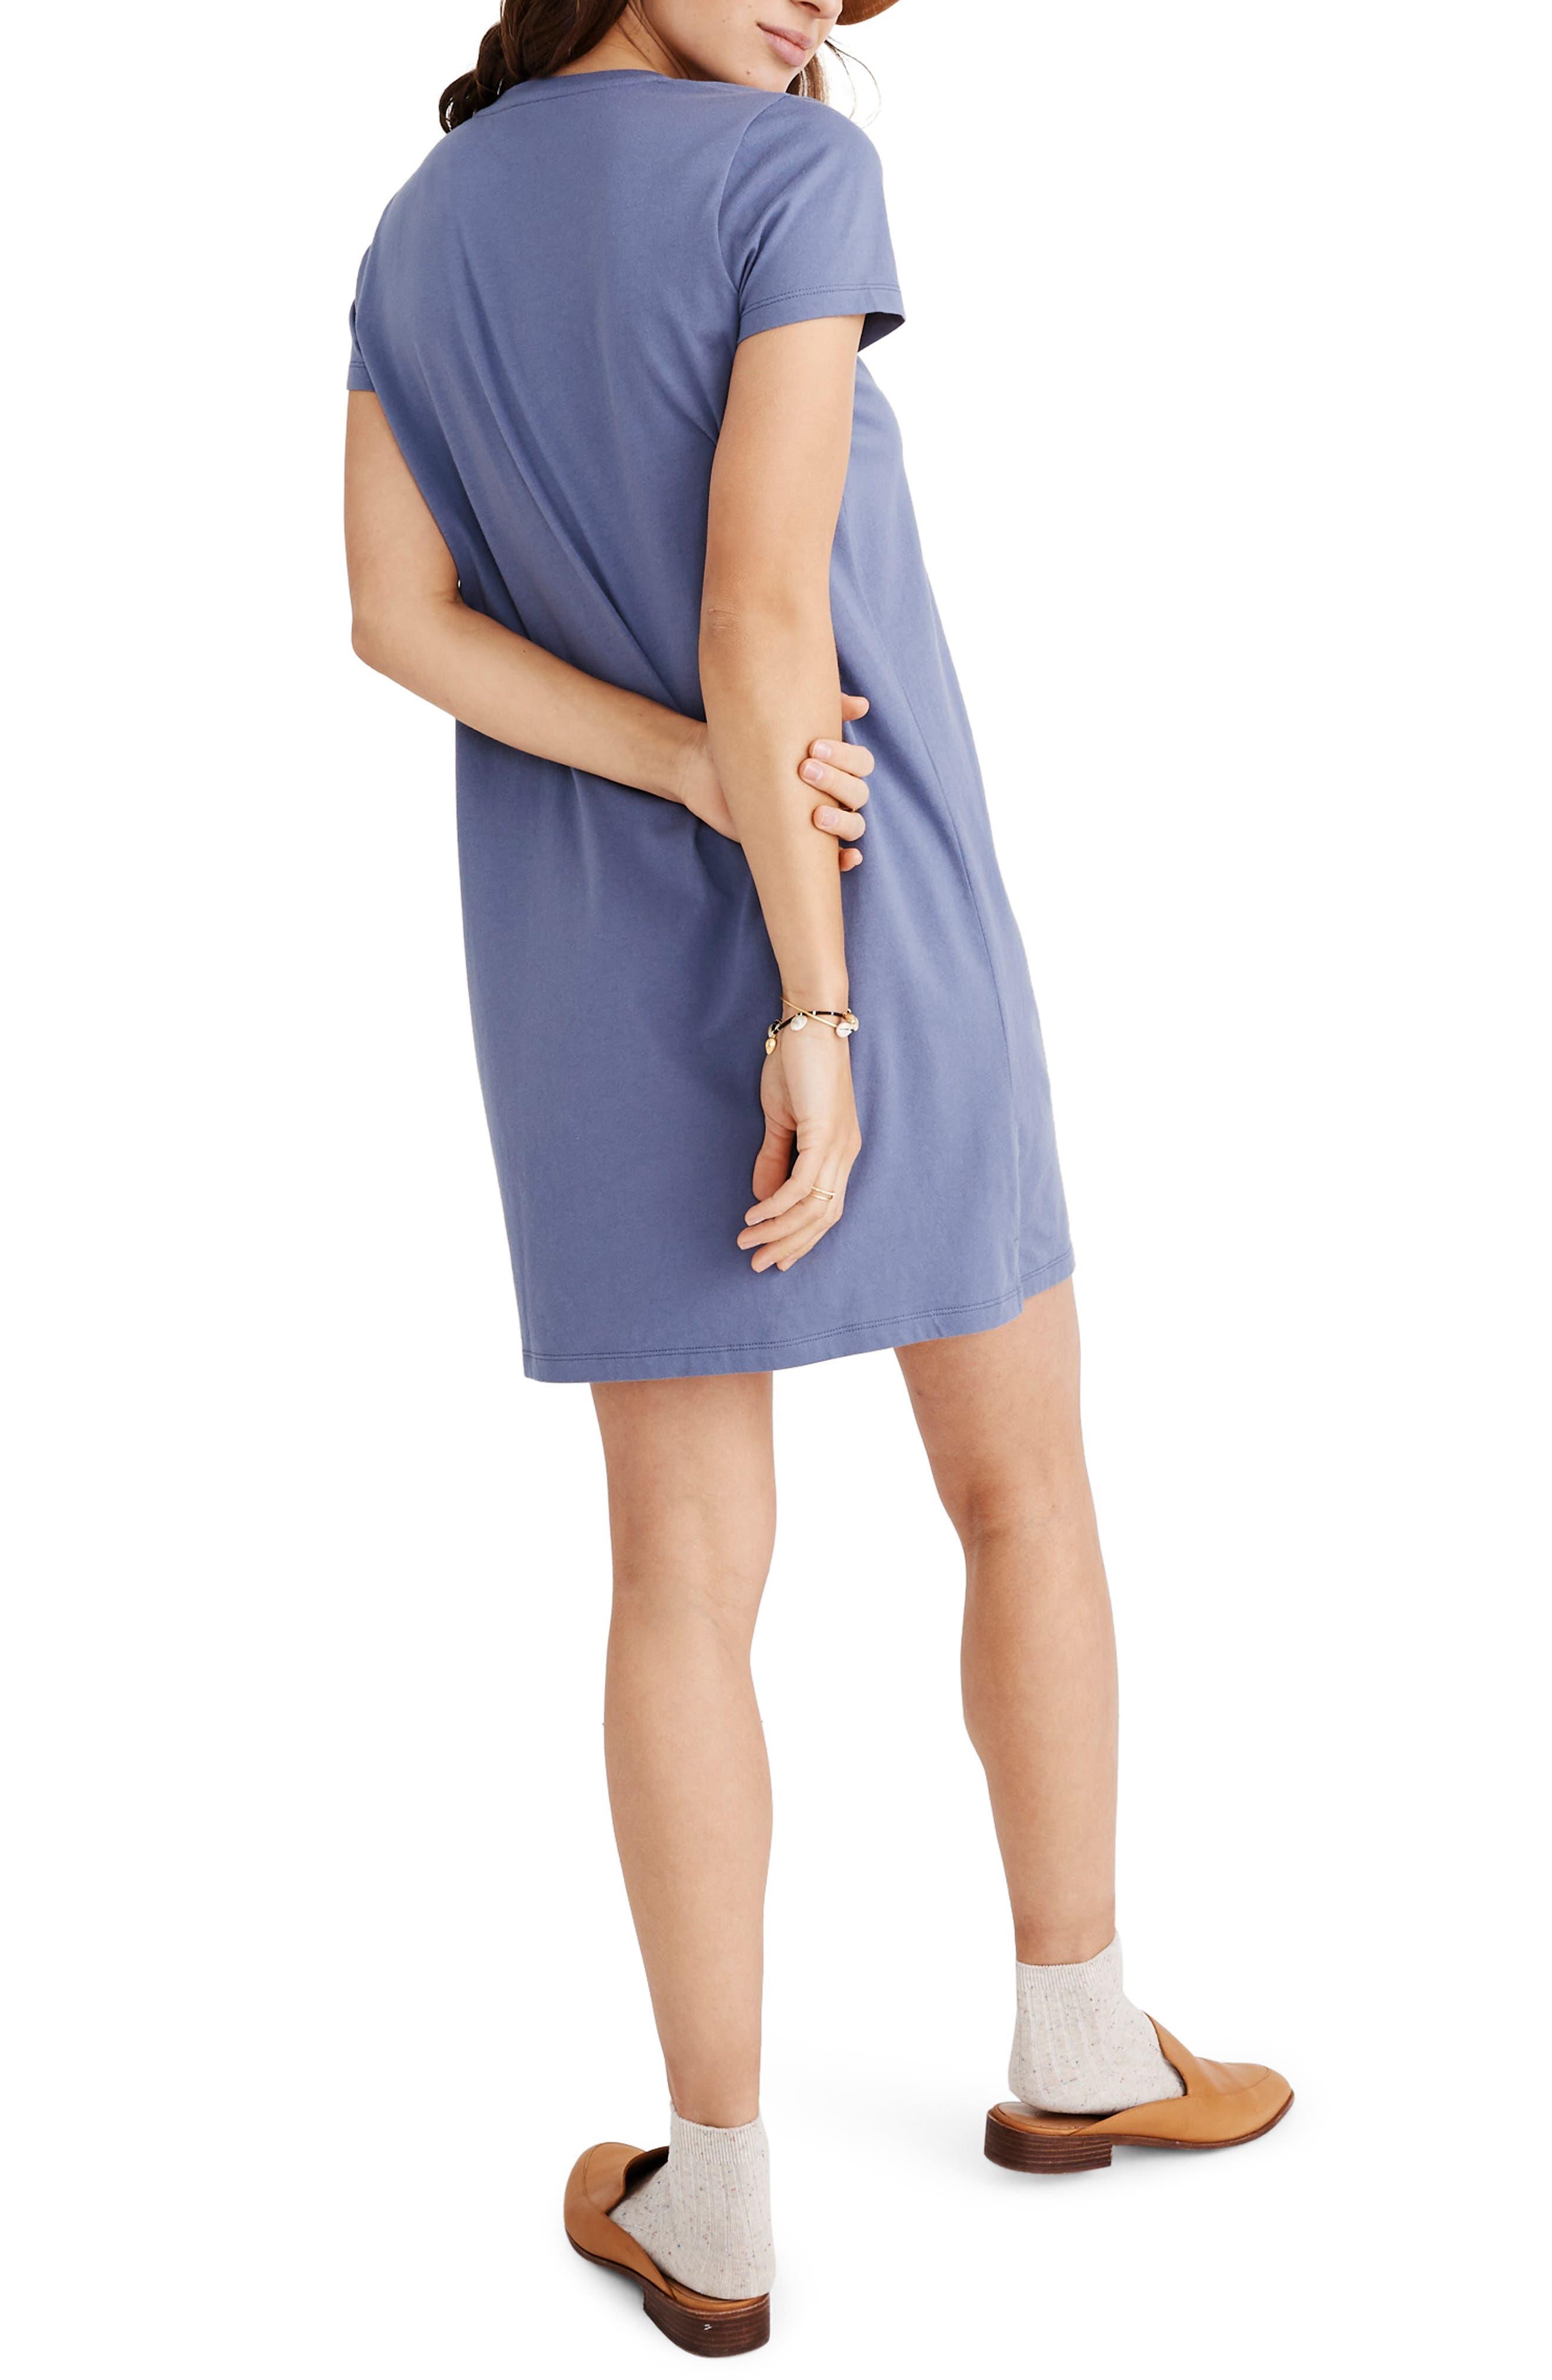 MADEWELL, Northside V-Neck T-Shirt Dress, Alternate thumbnail 2, color, PALE SHADOW